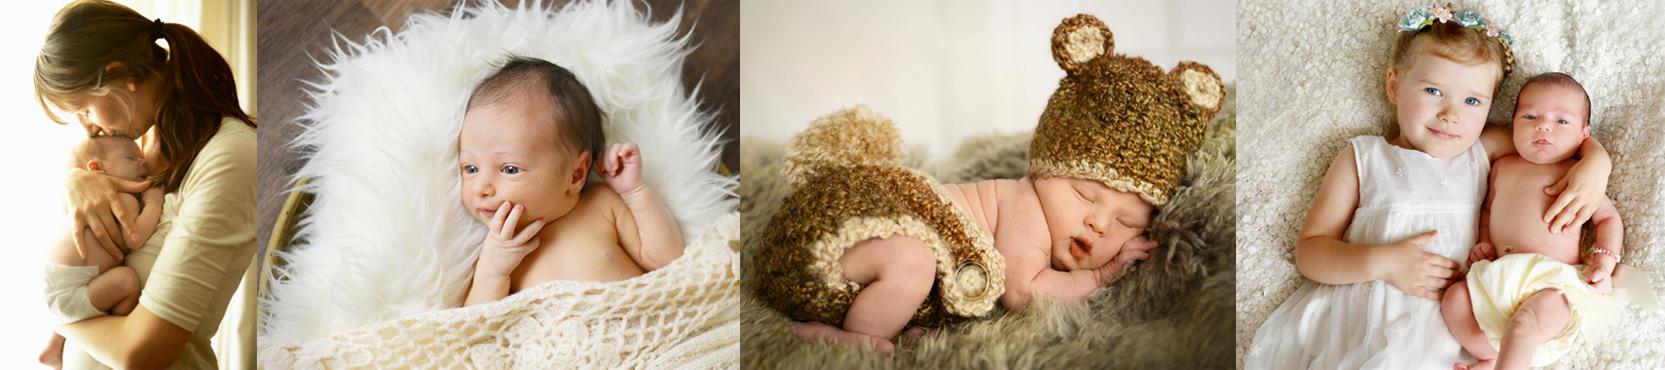 baby-neugeborenen-fotograf-dusseldorf